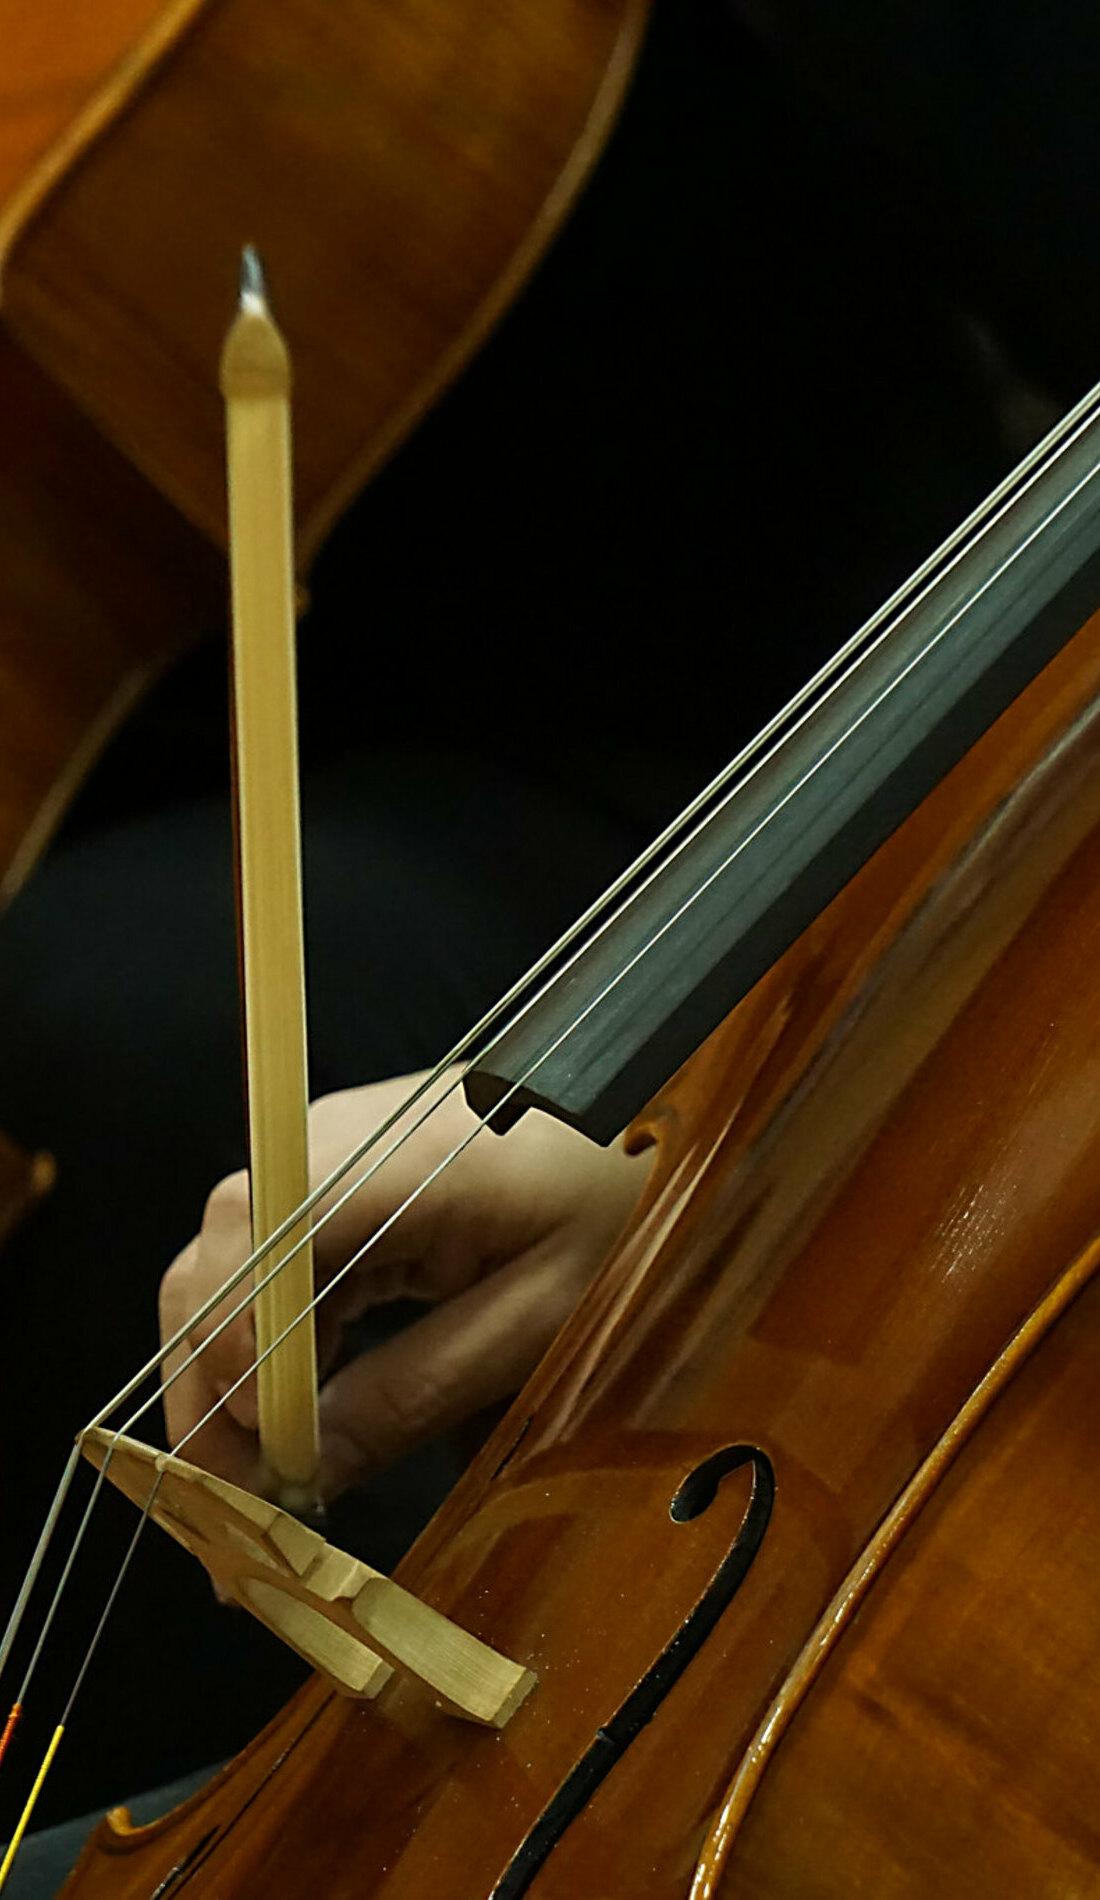 A Tucson Symphony Orchestra live event